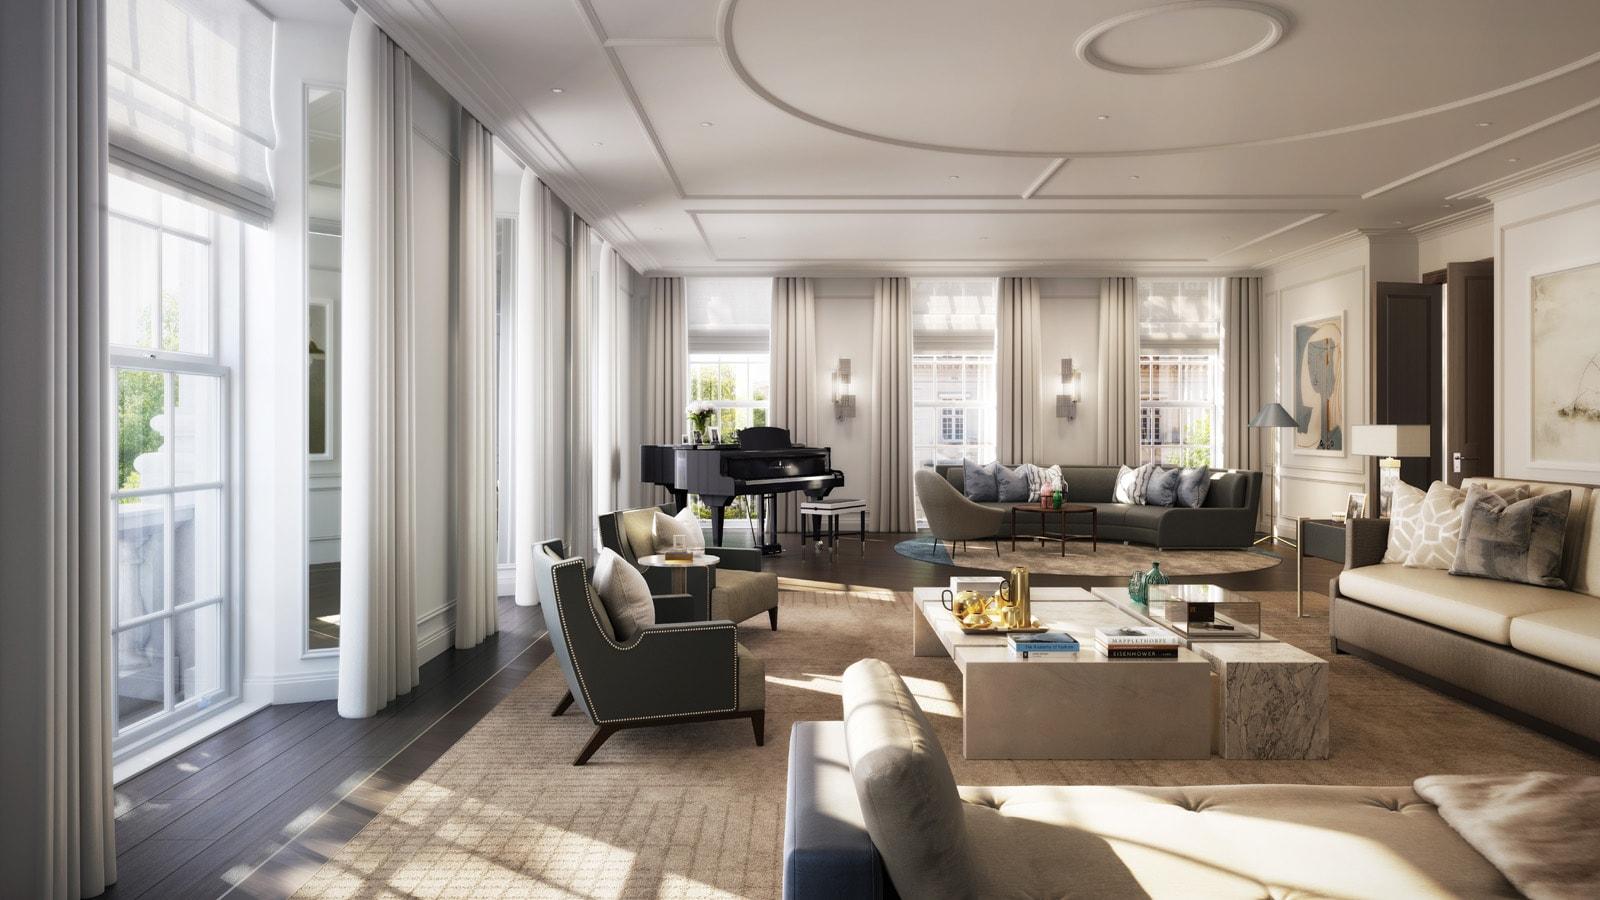 Four Seasons bringt Private Residences nach London 4